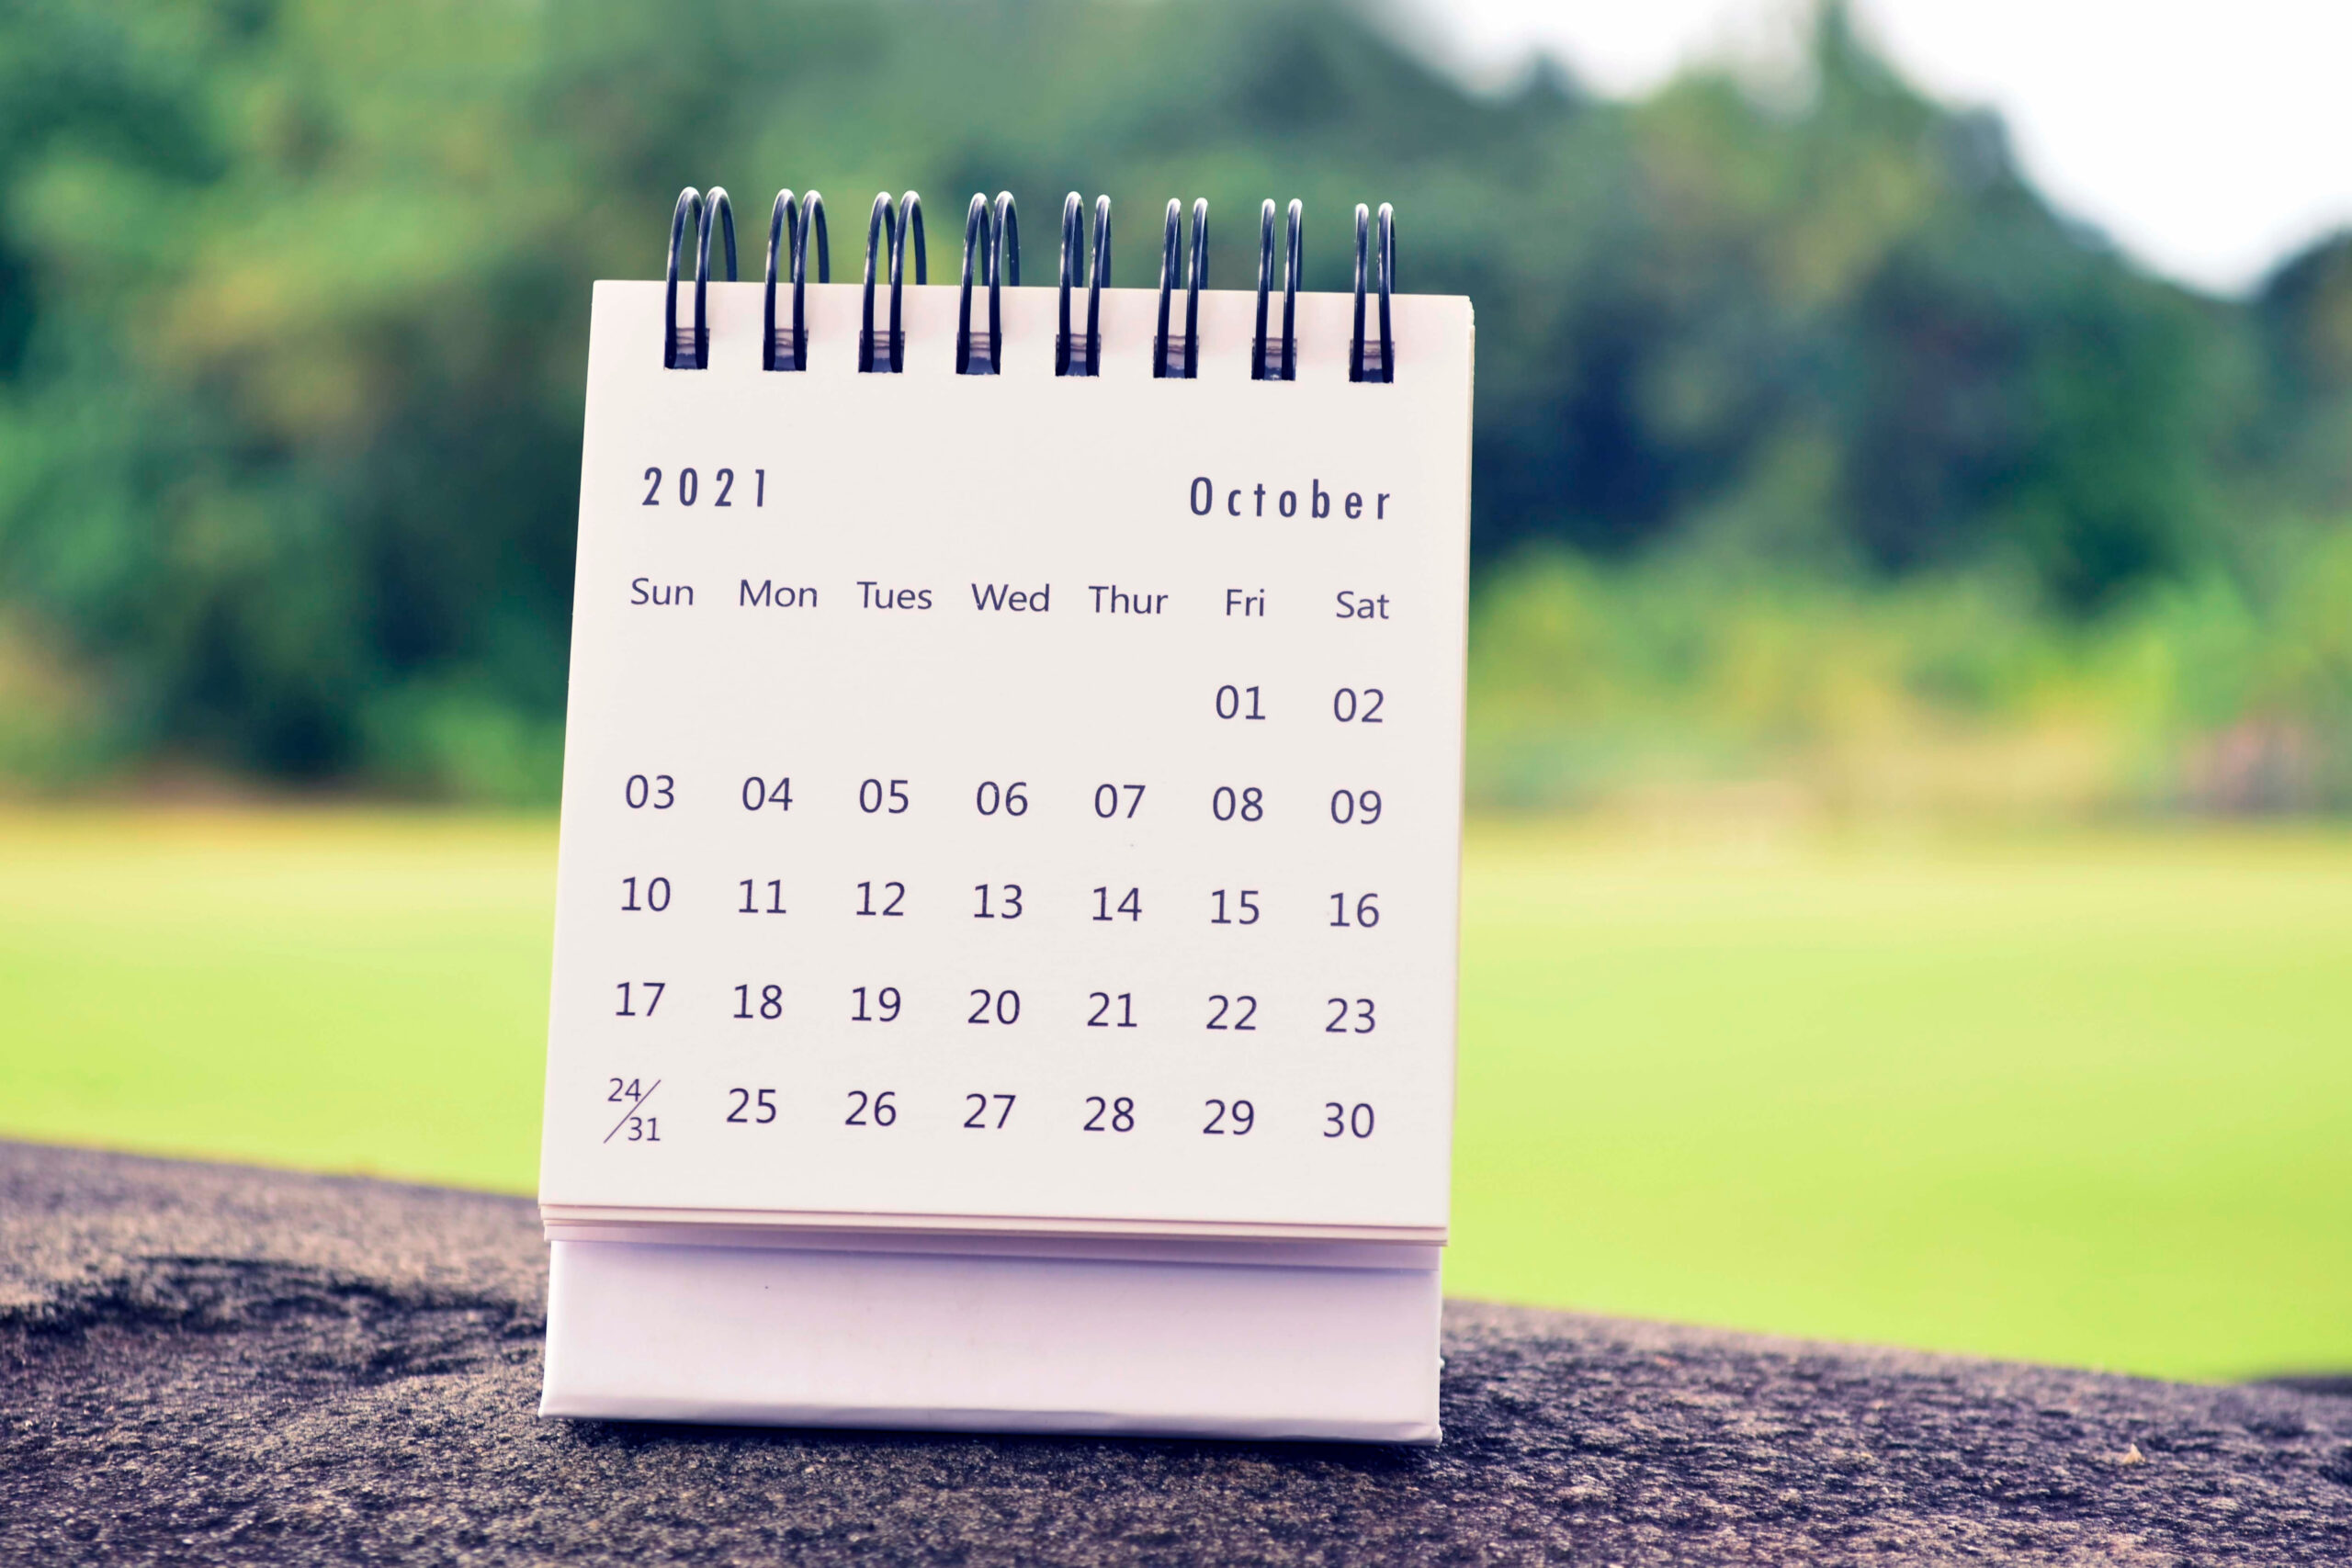 https://www.shutterstock.com/image-photo/october-2021-calendar-